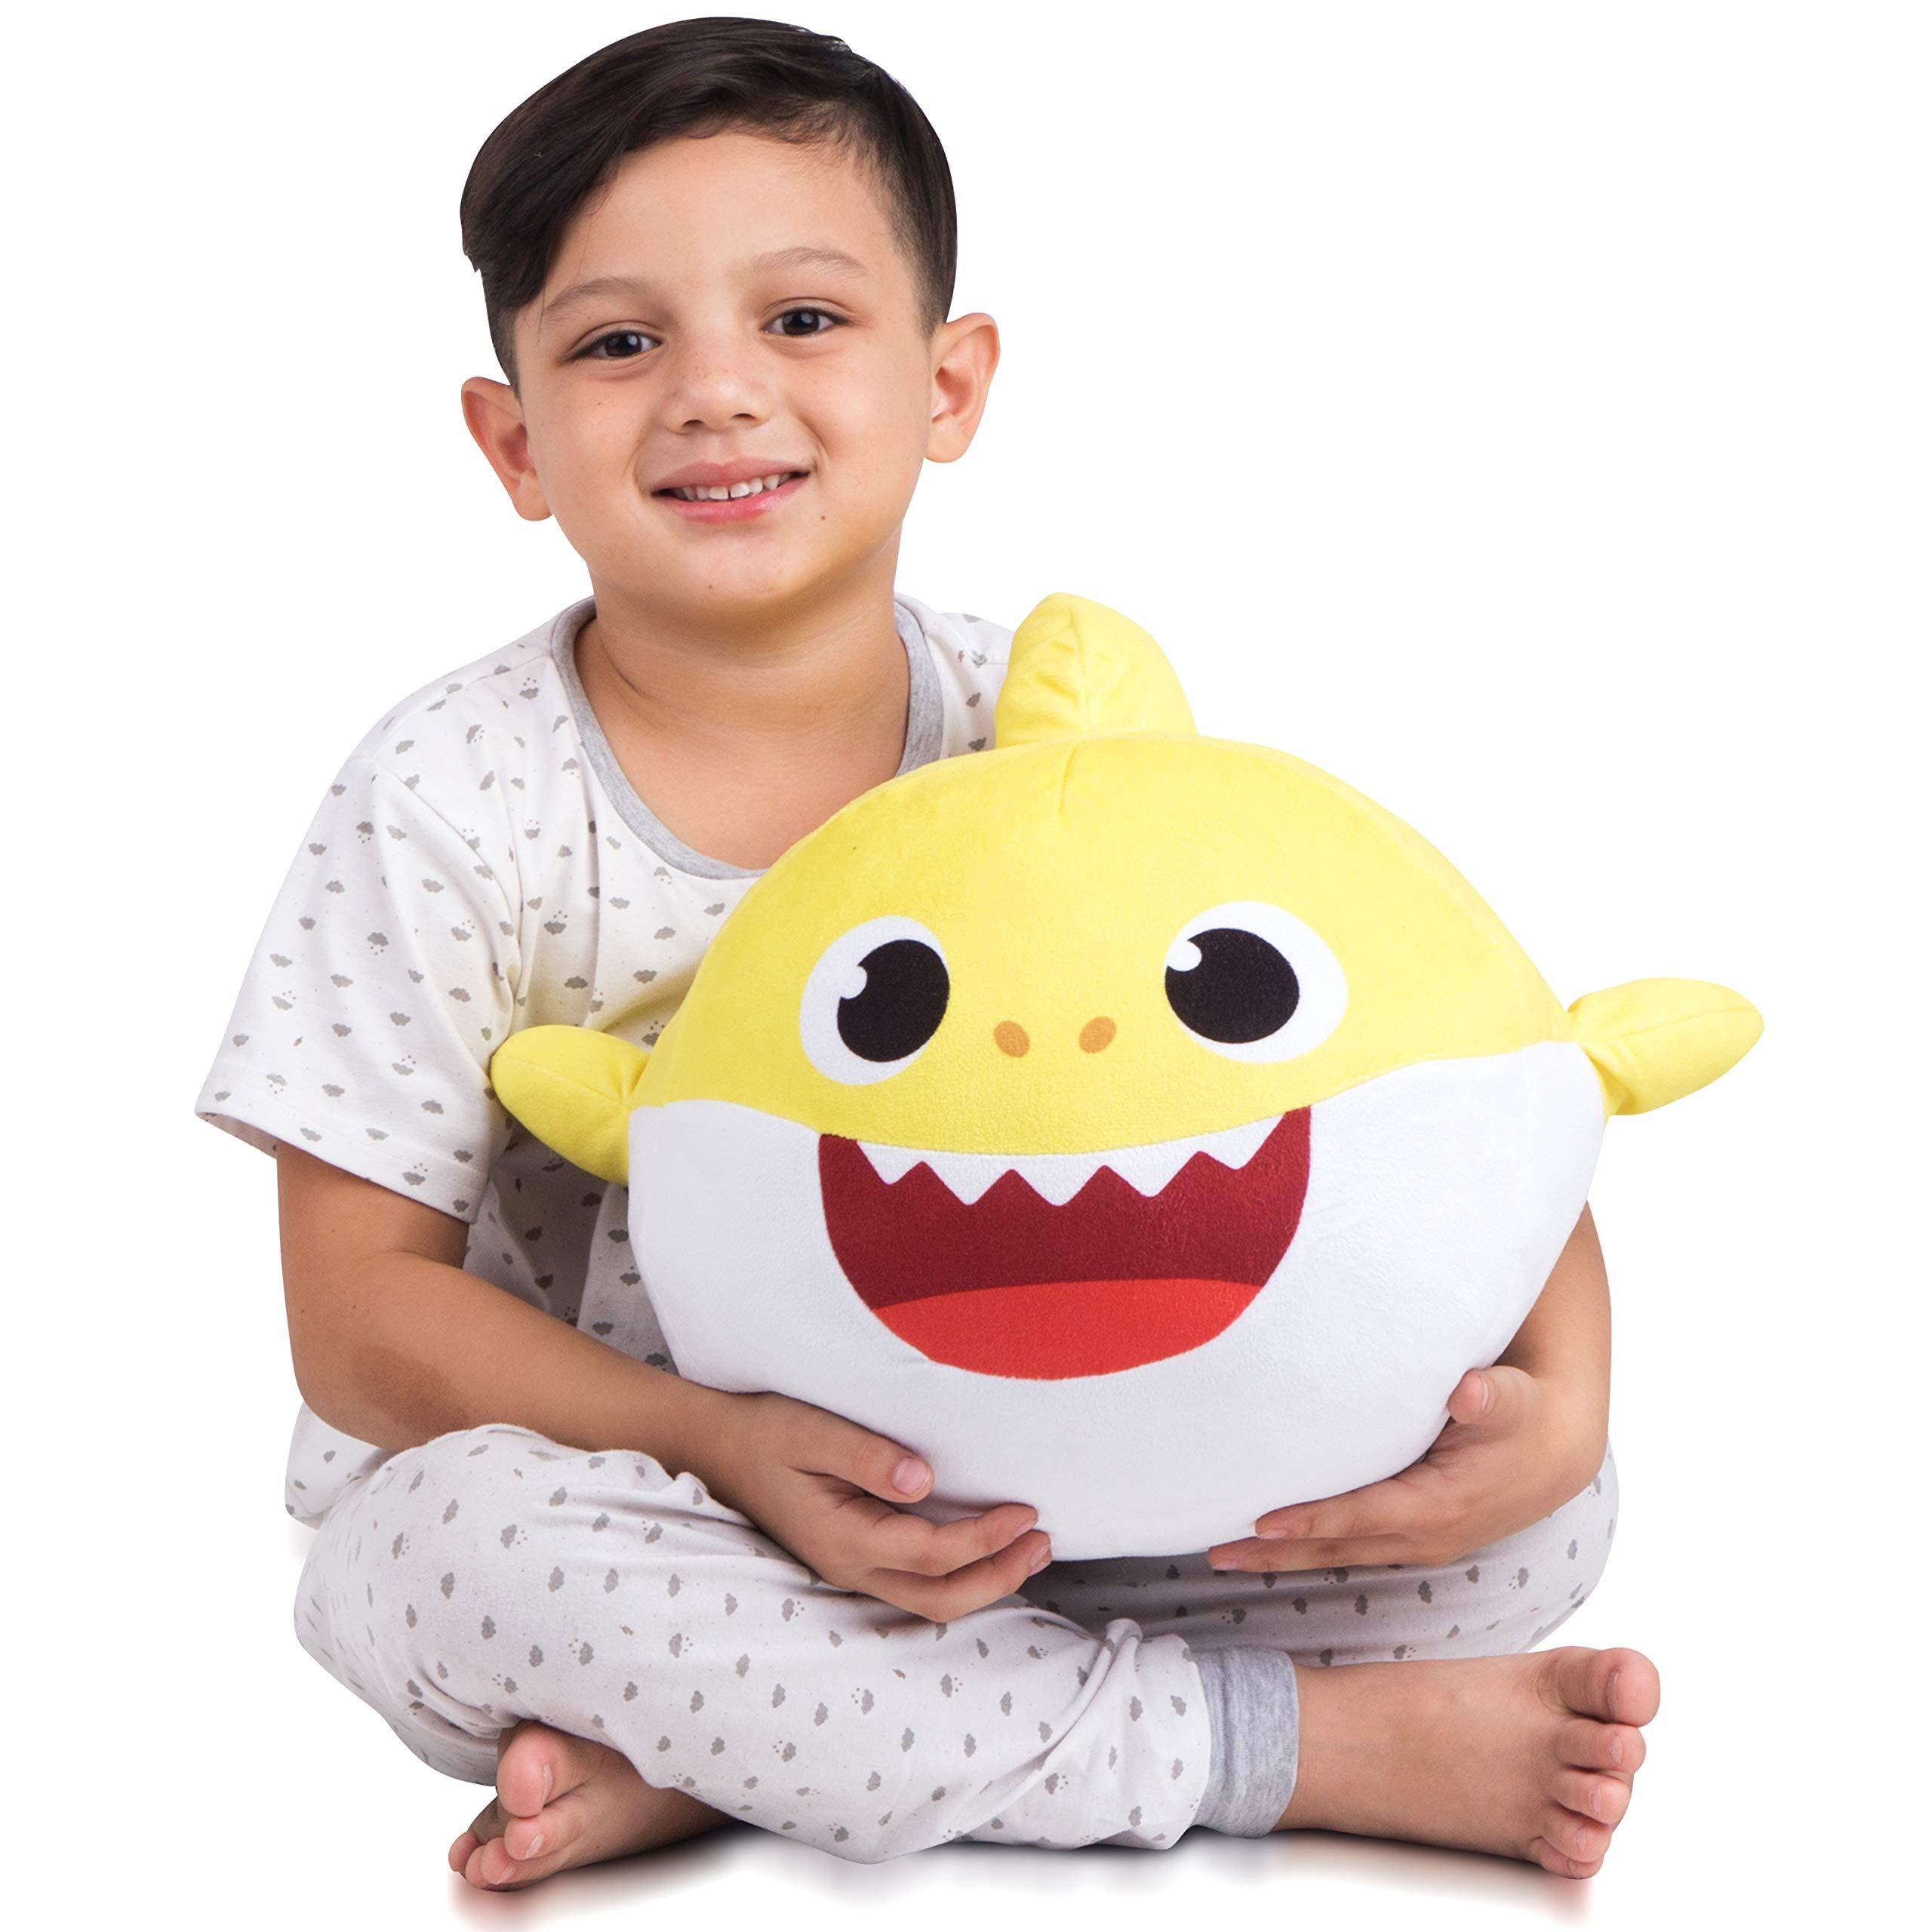 Franco Kids Bedding Cuddle Pillow Buddy, One Size, PJ Masks Catboy